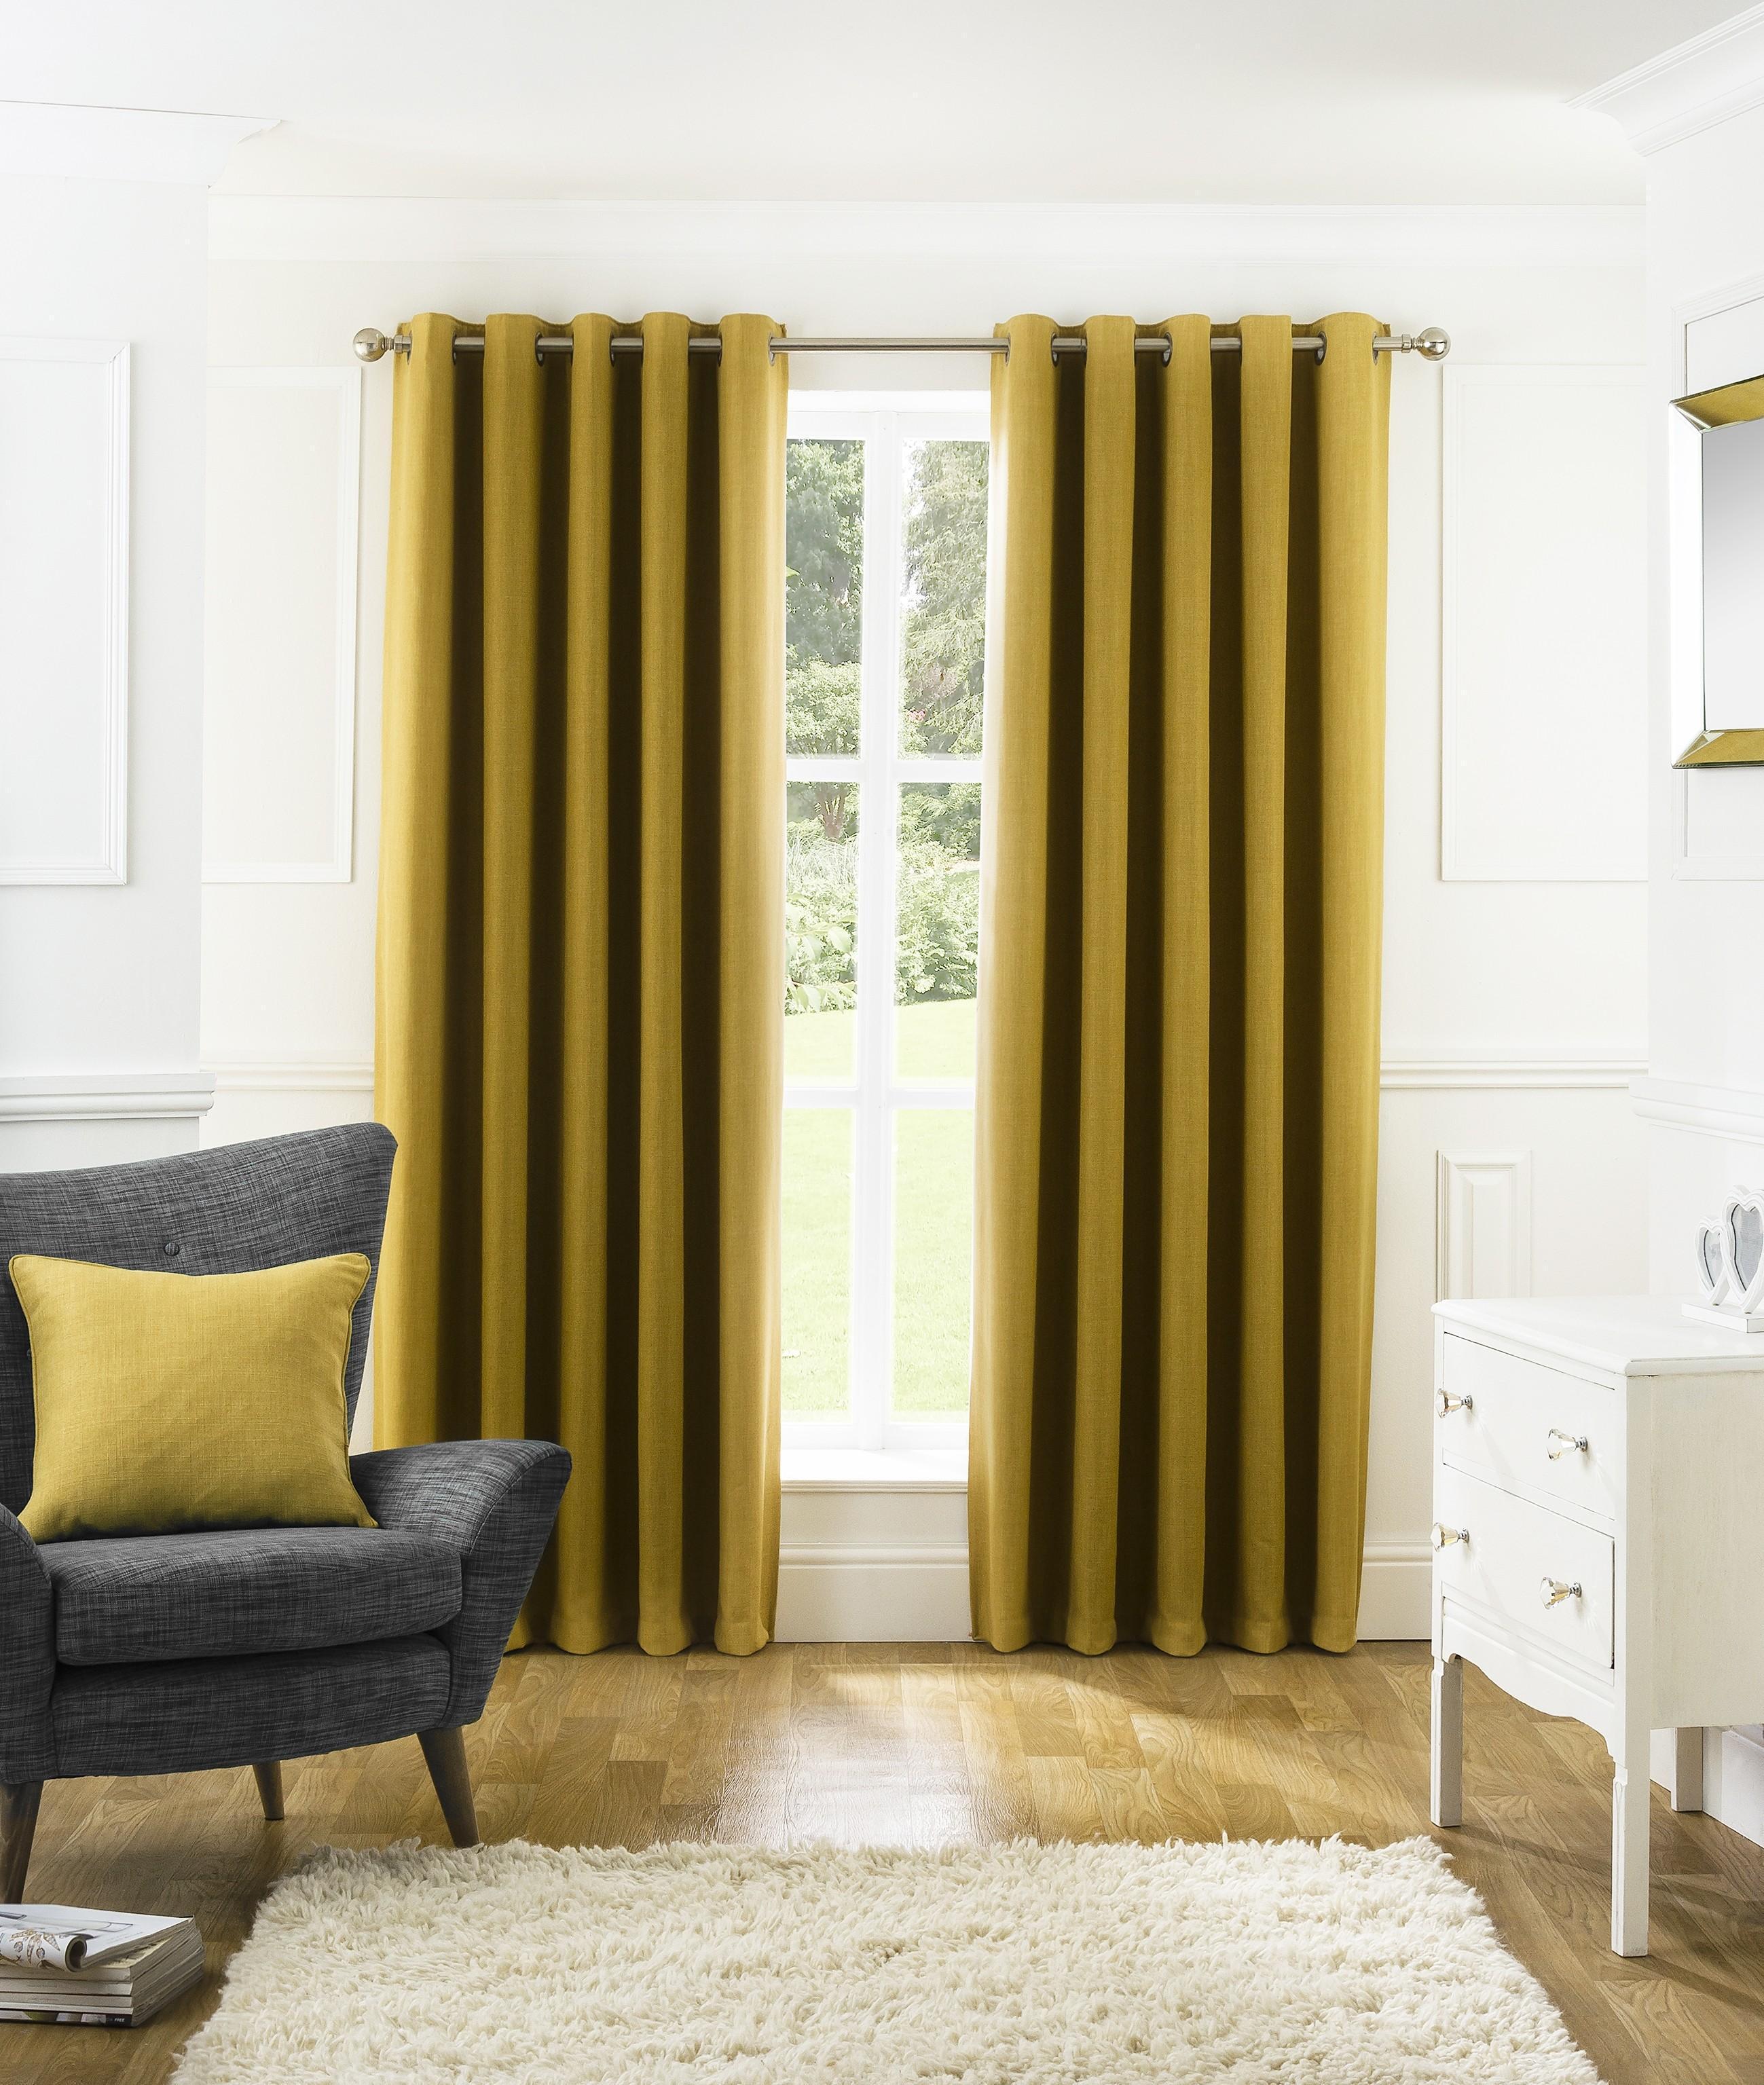 harlow thermal blackout eyelet curtains ochre ponden home. Black Bedroom Furniture Sets. Home Design Ideas